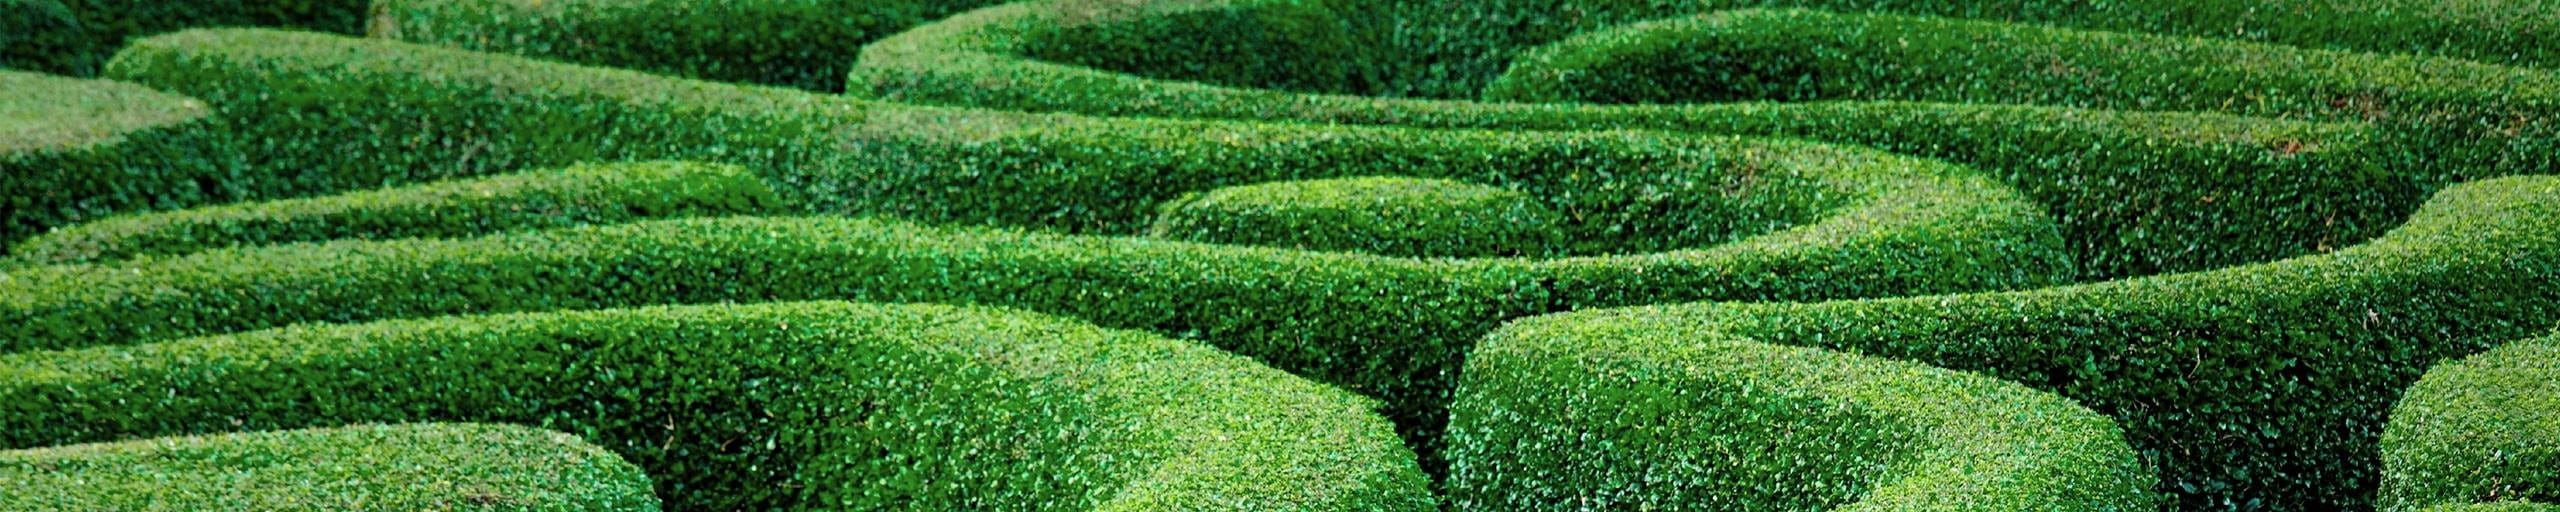 Un labirinto.